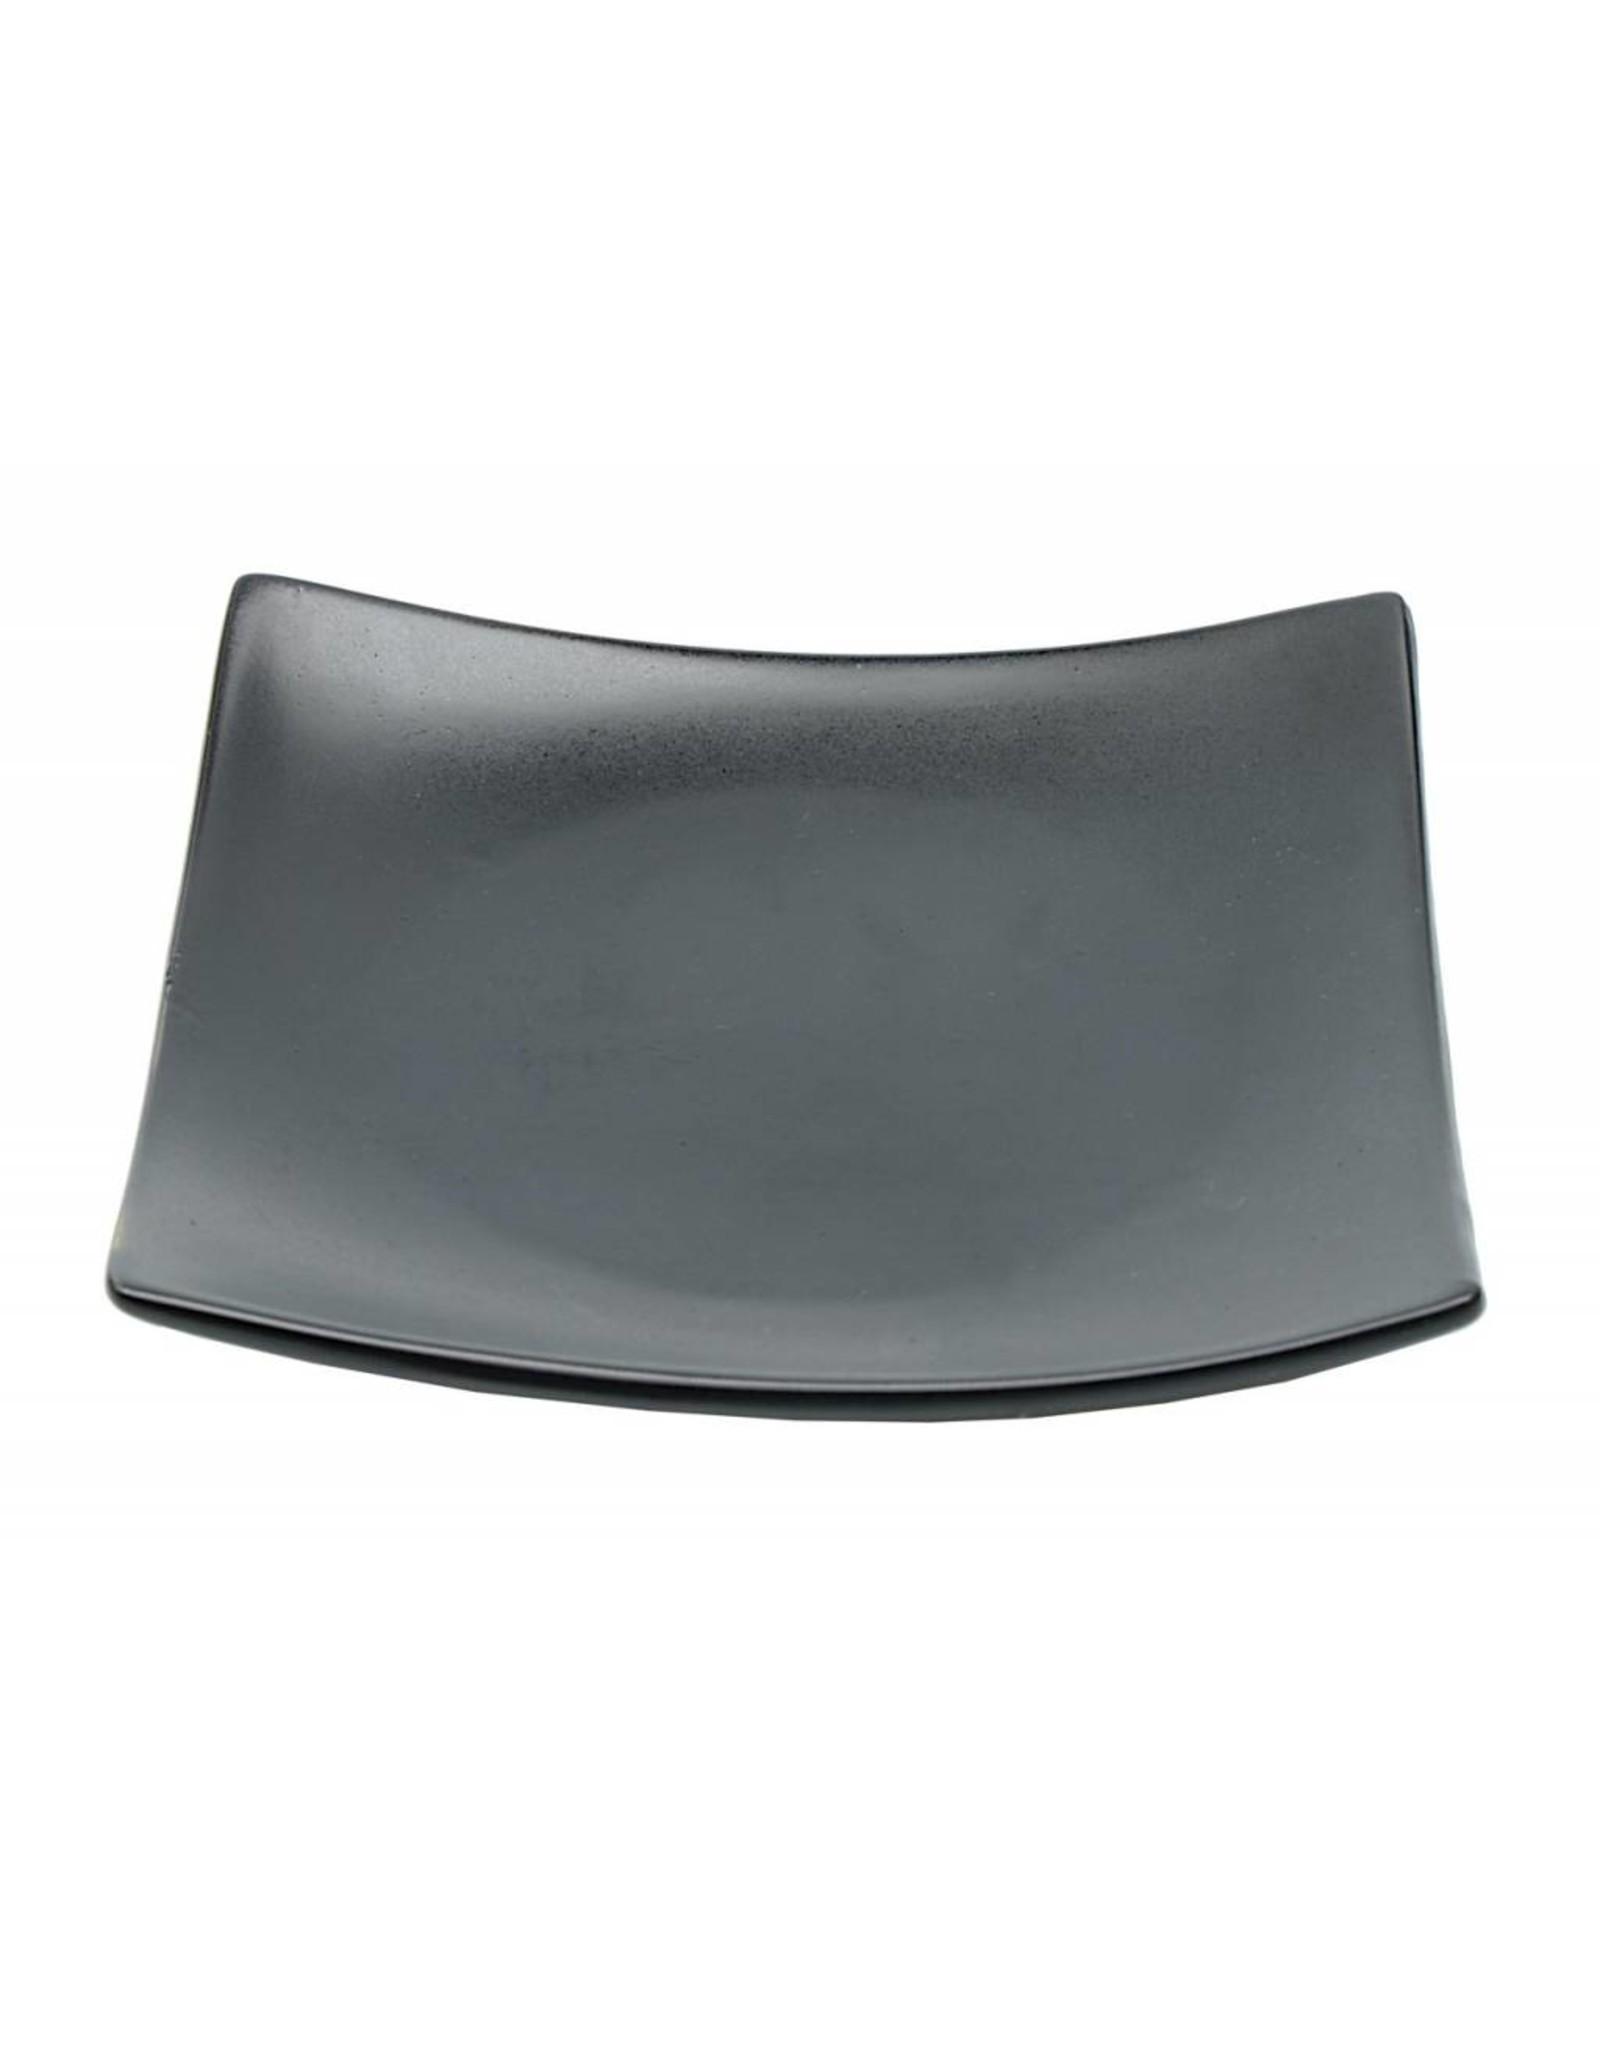 Tokyo Design Studio Black Series bord 16.5x16.5cm mat zwart